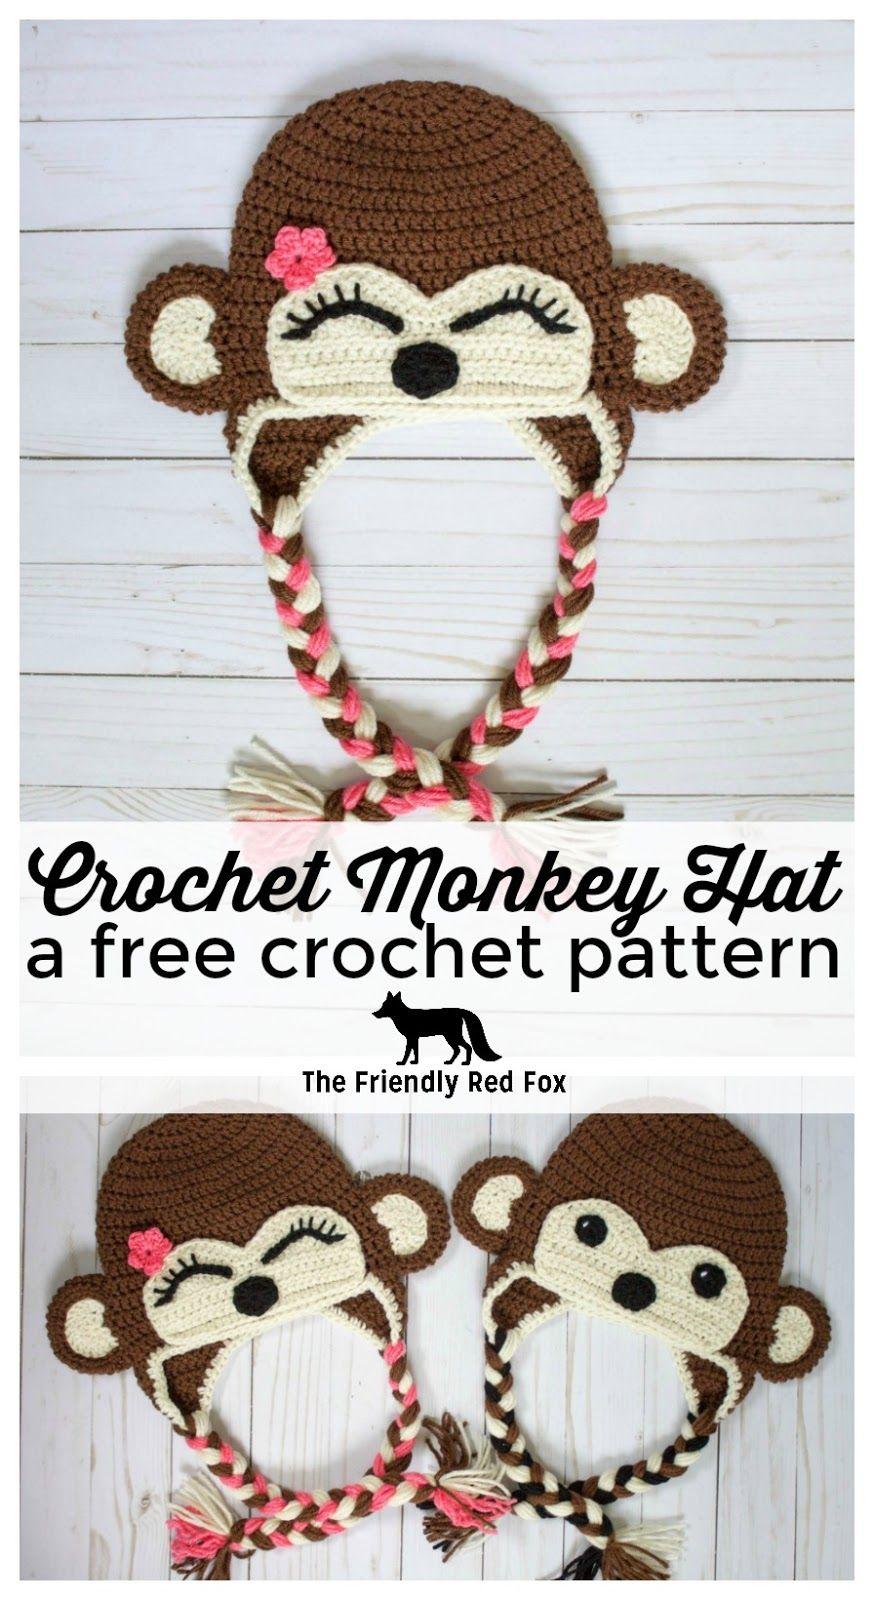 Free Crochet Monkey Hat Pattern | Gorros, Gorros crochet y Gorro tejido